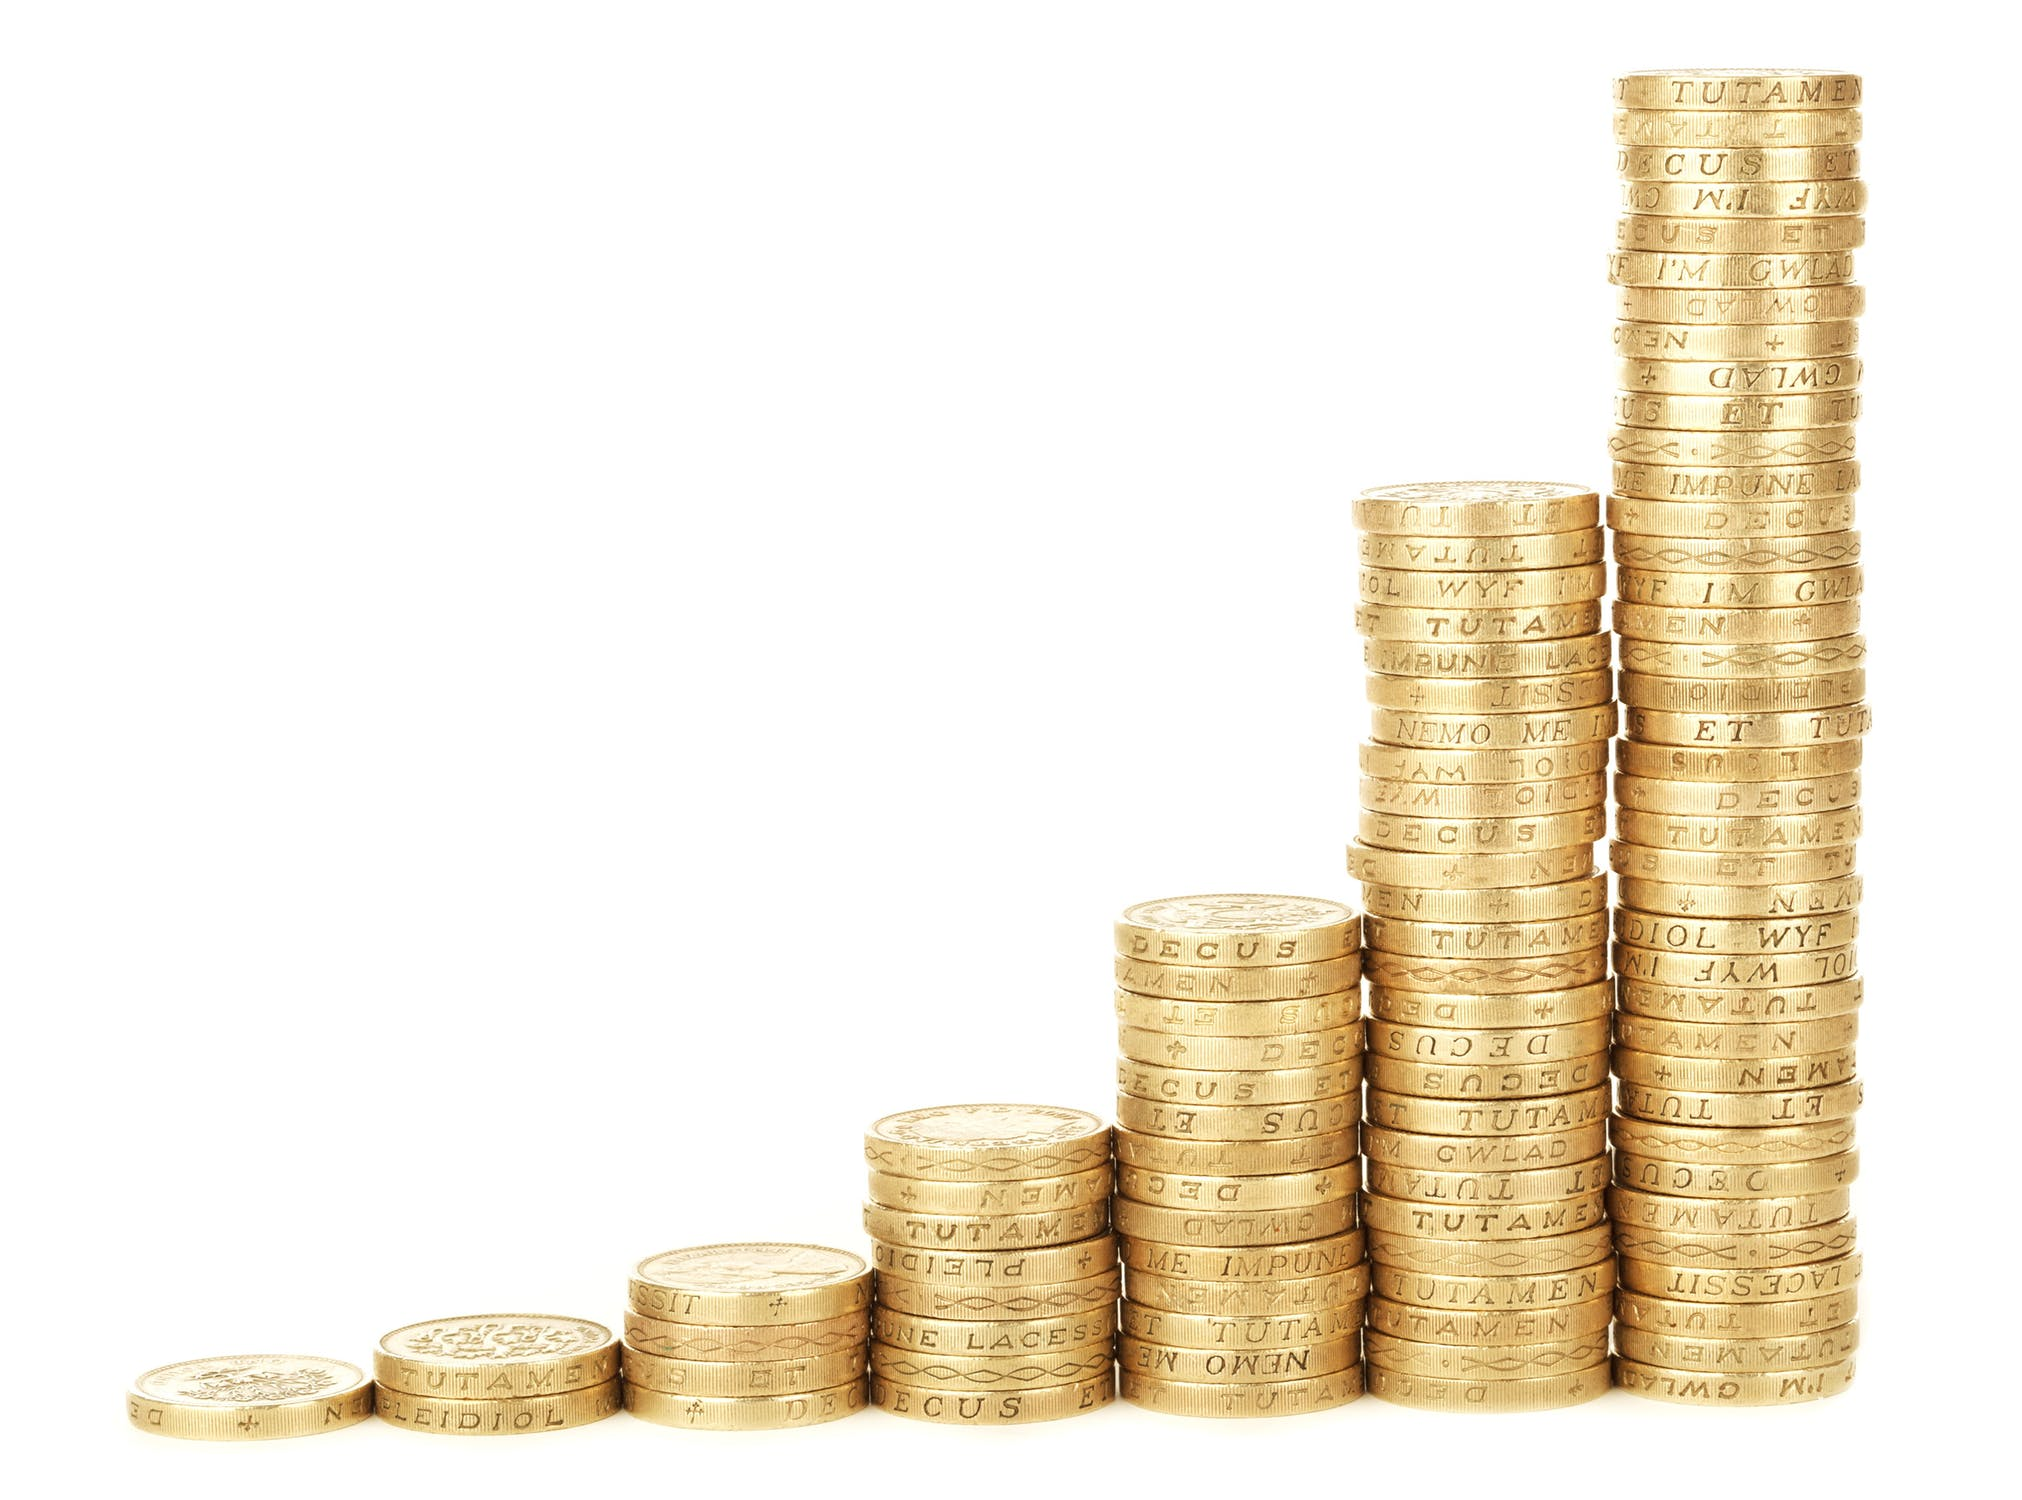 Renters rente med crowdlending investering